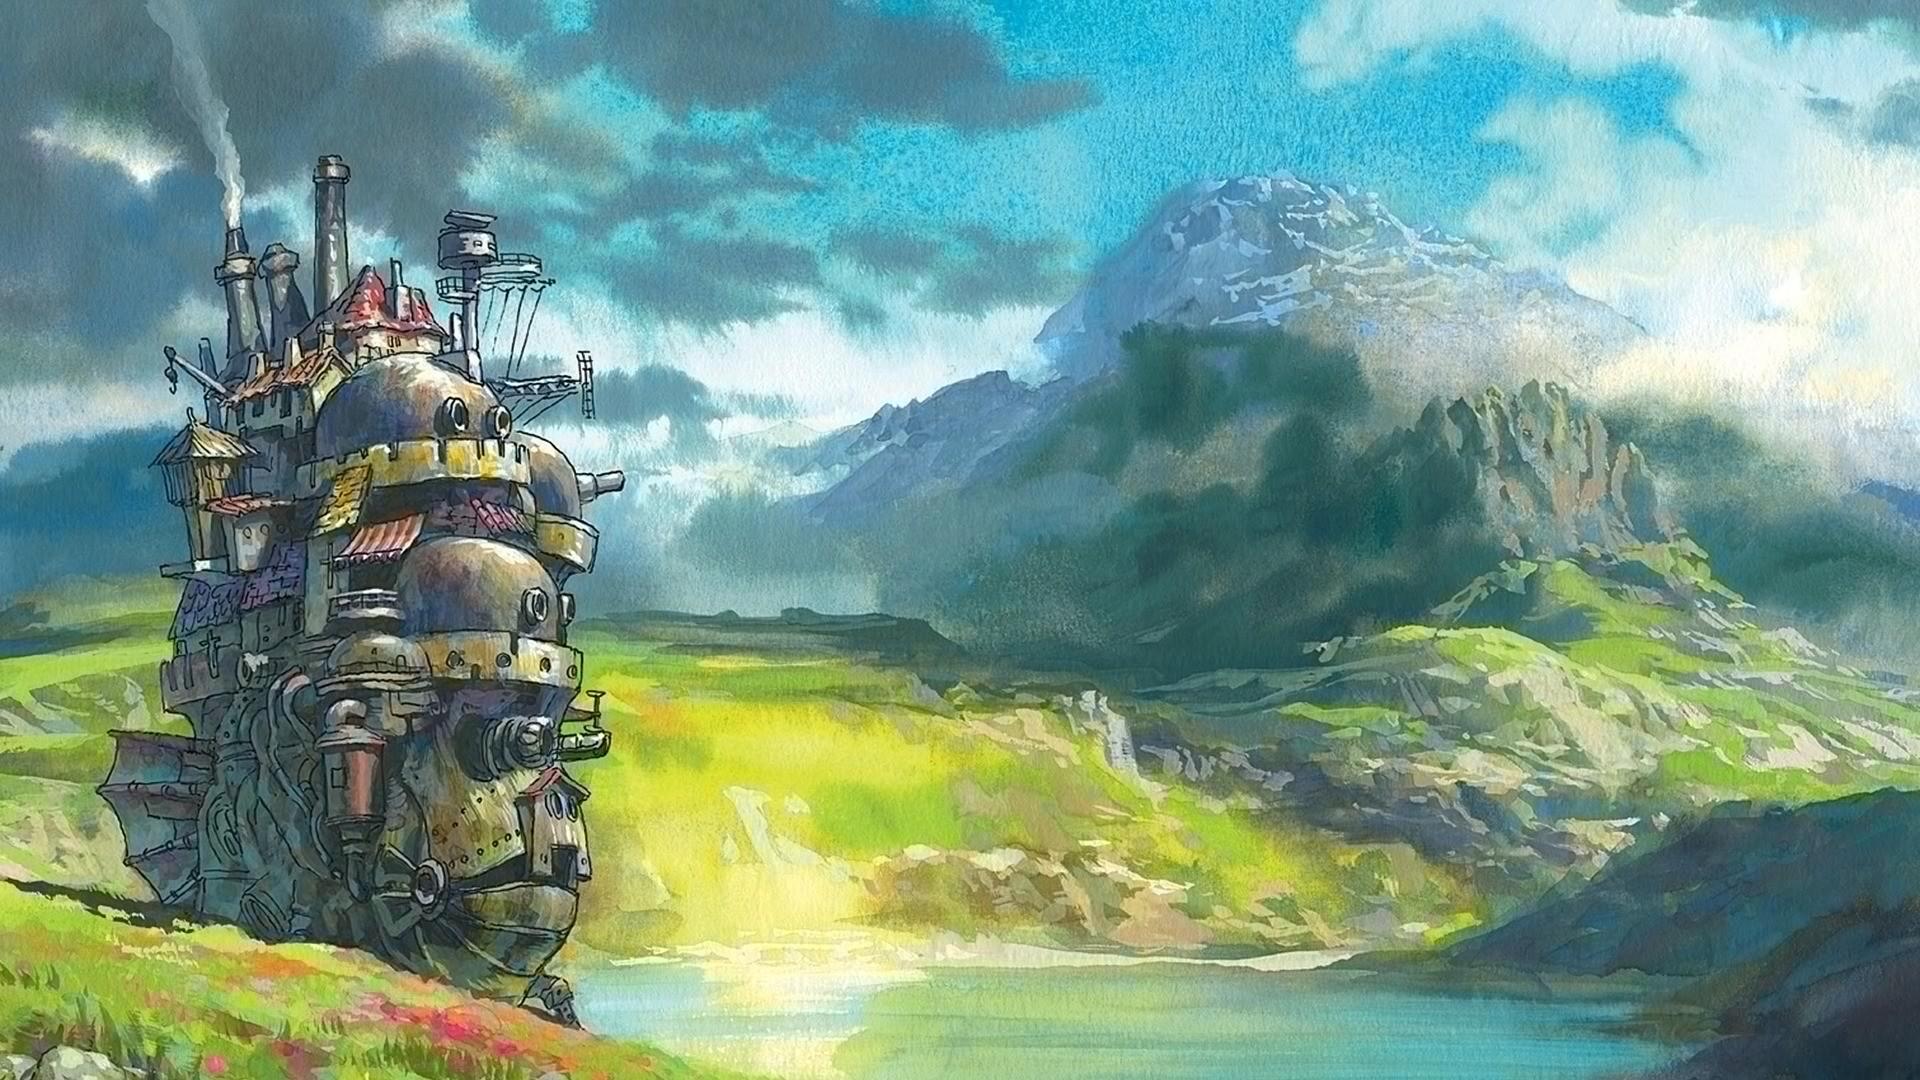 Ghibli HD Download